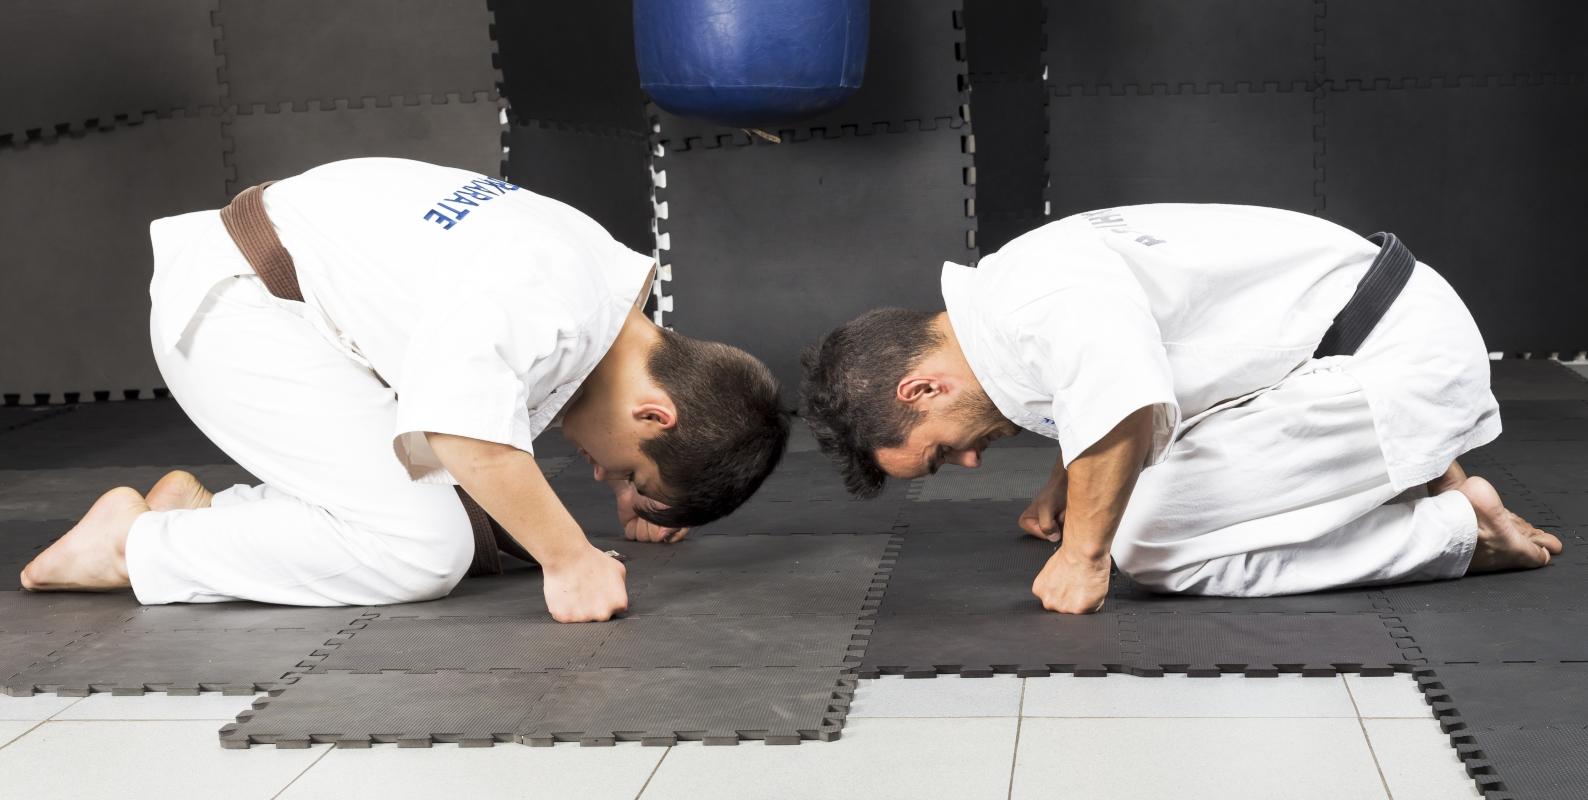 la filosofia del karate